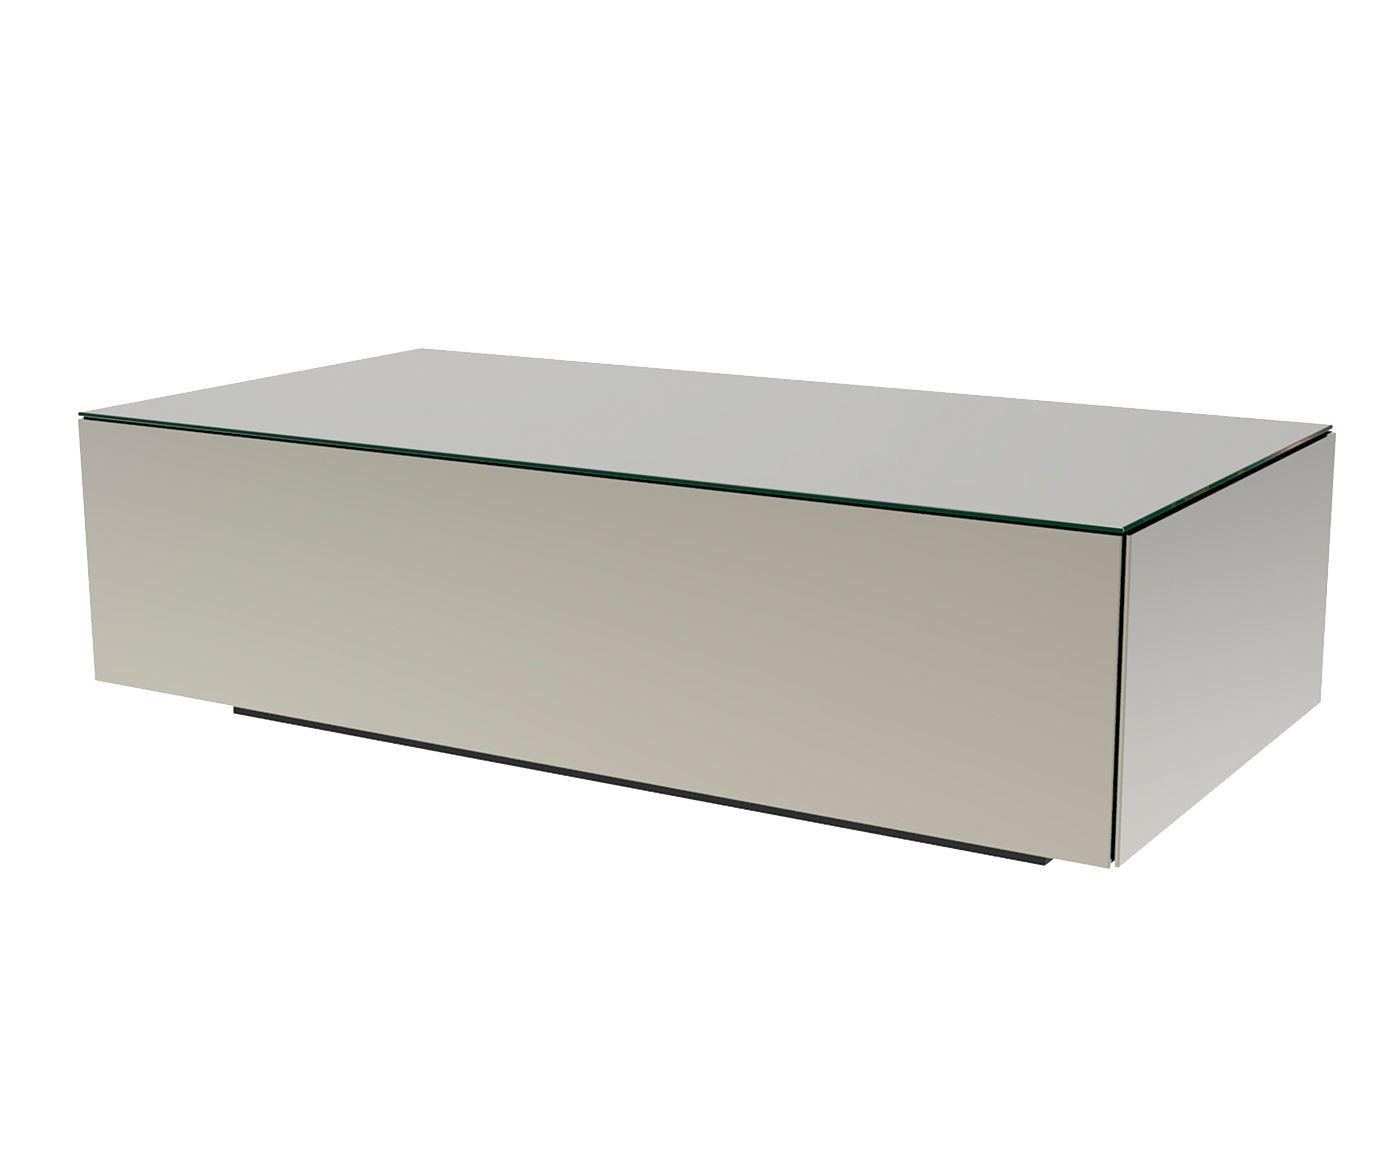 MESA DE CENTRO BOX - 140X35X70CM | Westwing.com.br